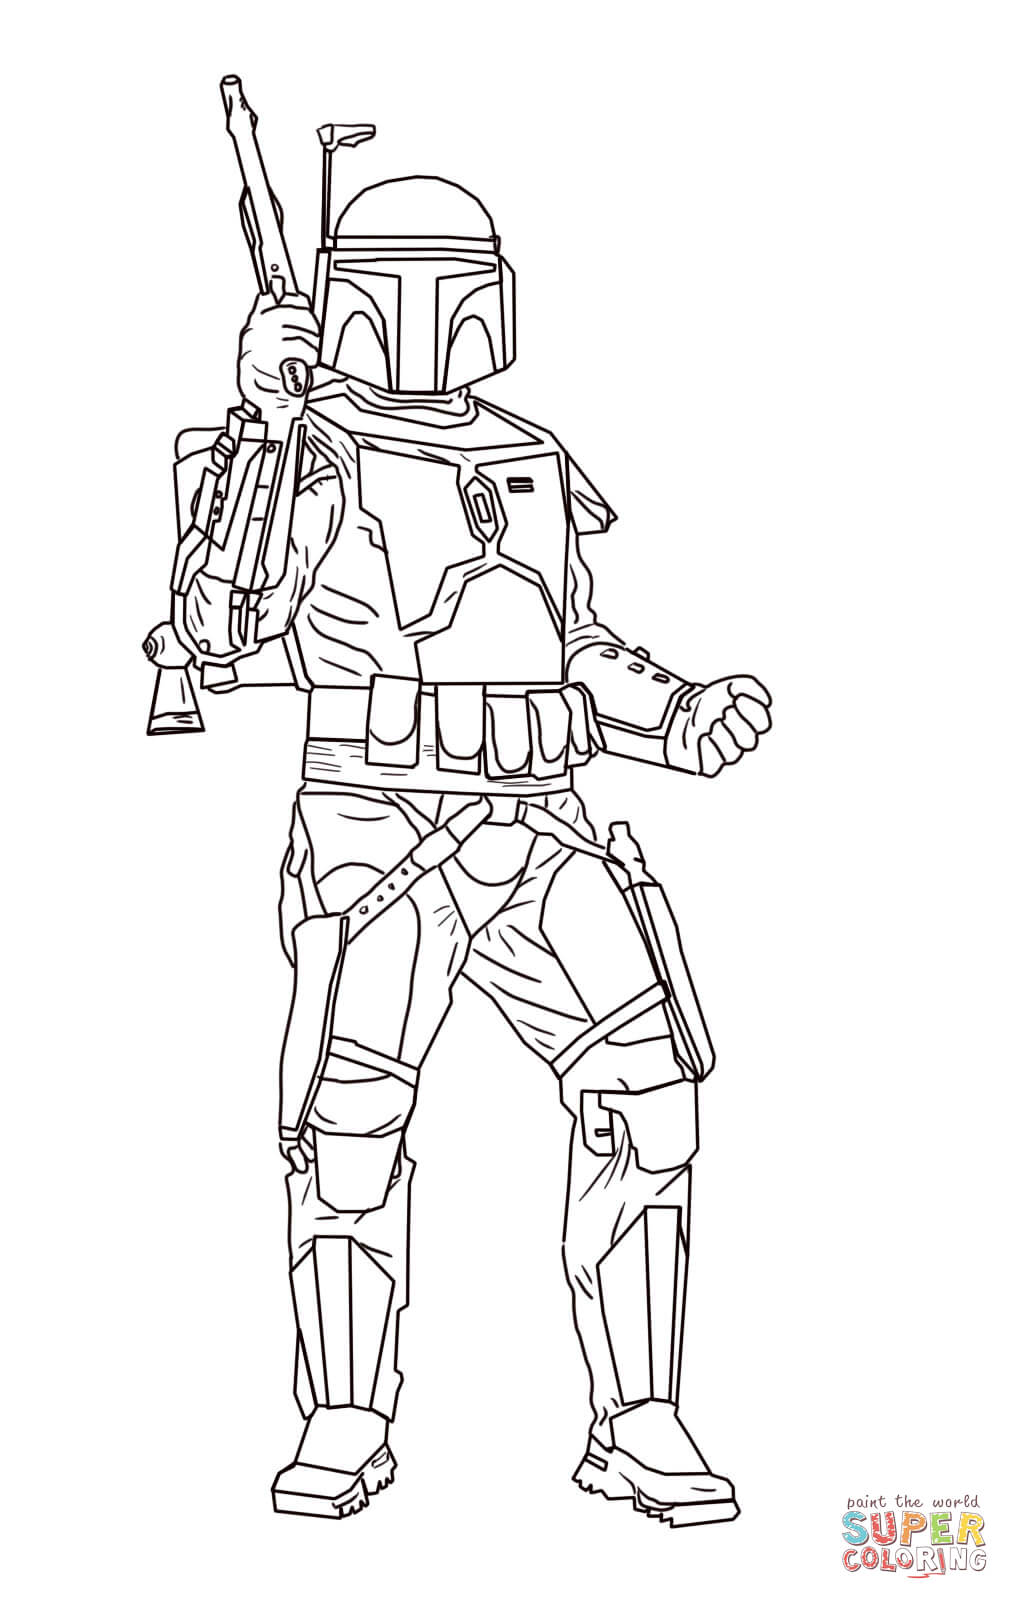 Boba Fett Helmet Drawing at GetDrawings | Free download